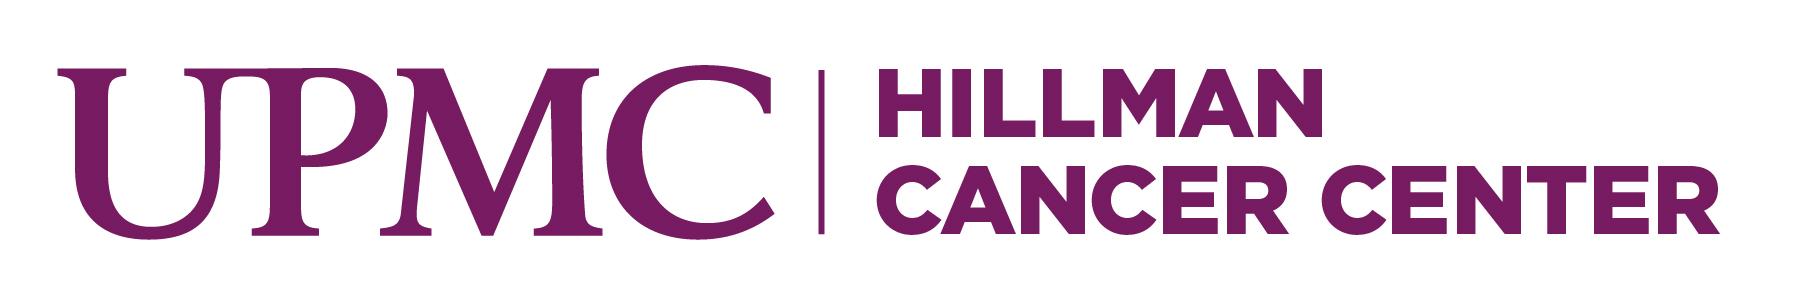 UPMC Hillman Cancer Center Logo